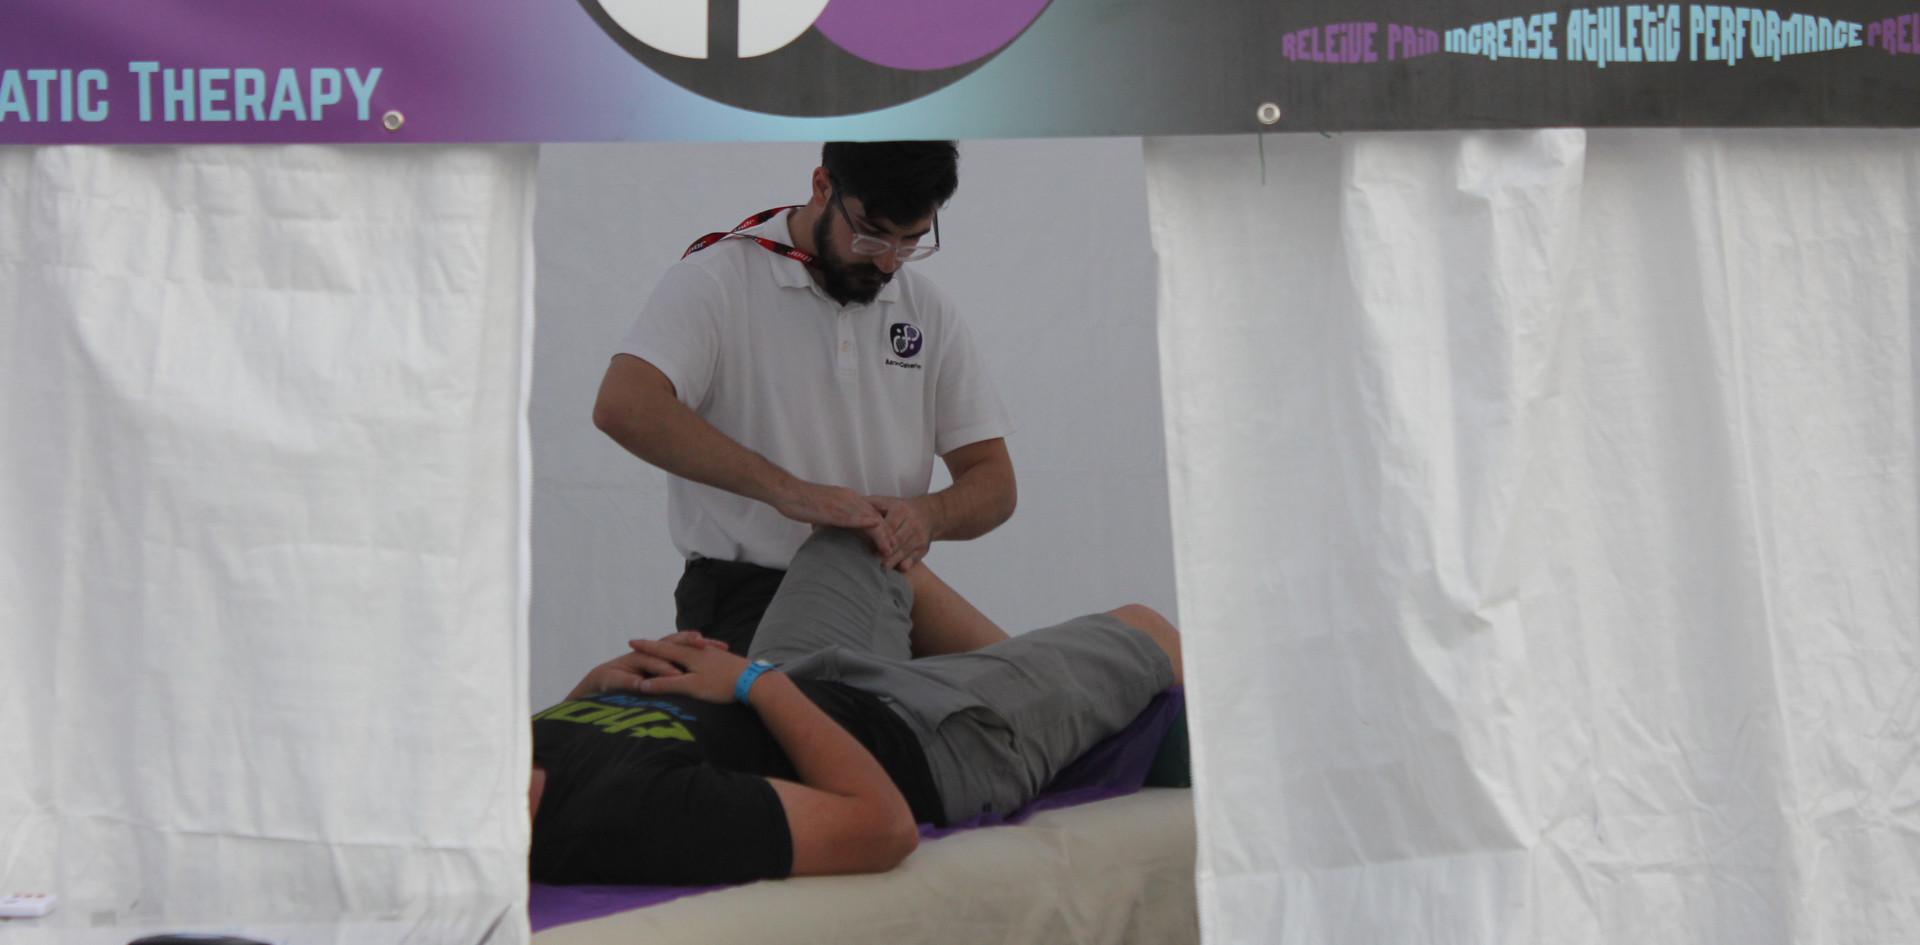 Adductor Treatment